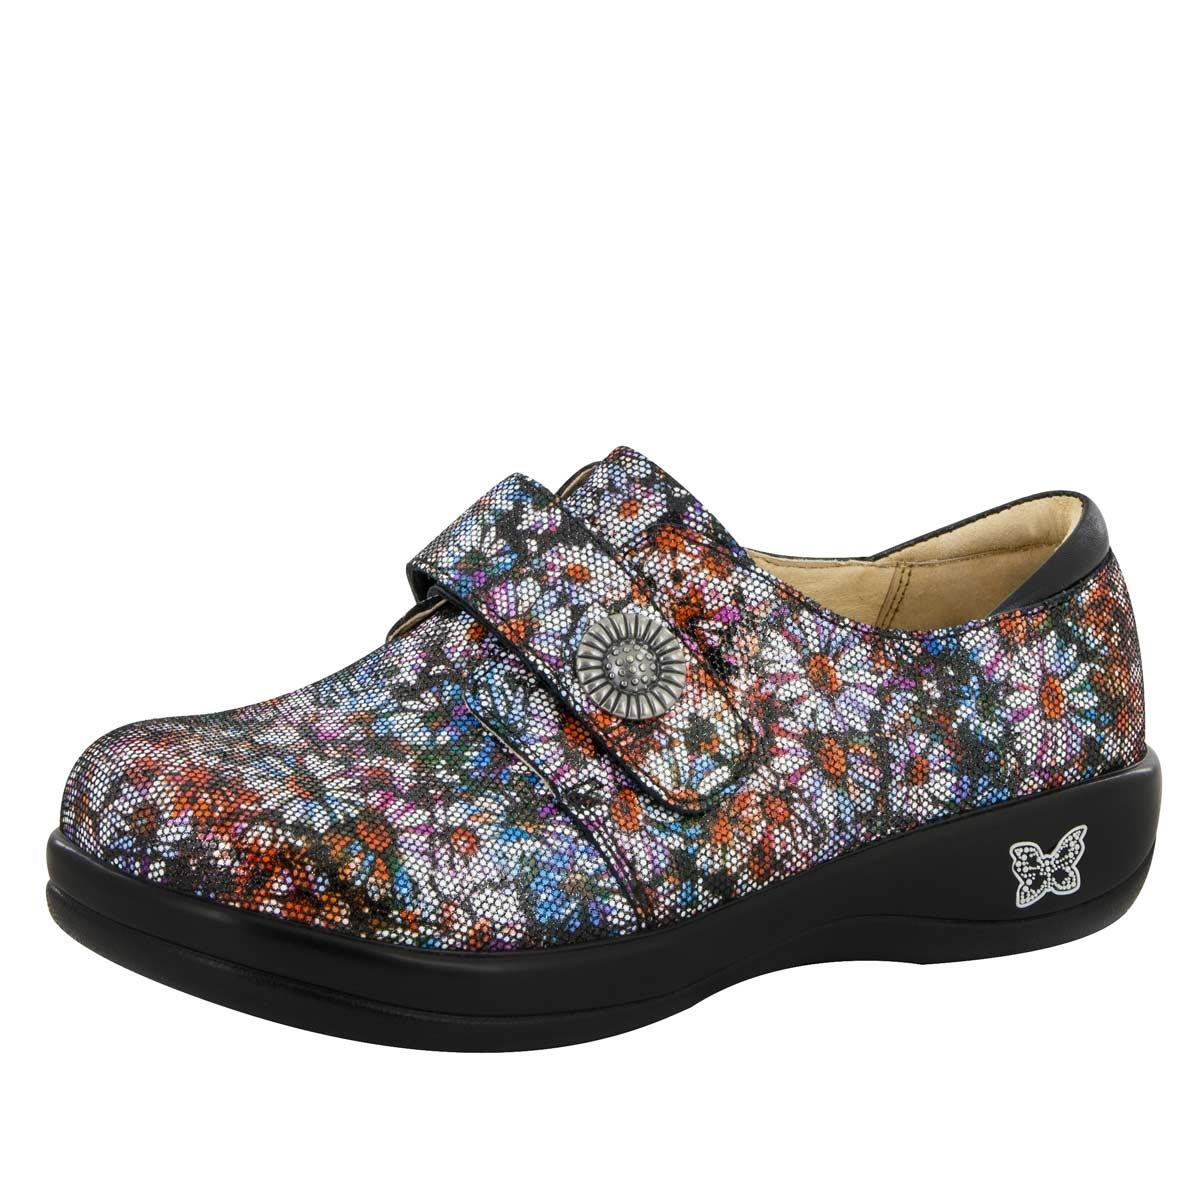 Alegria Wide Shoes